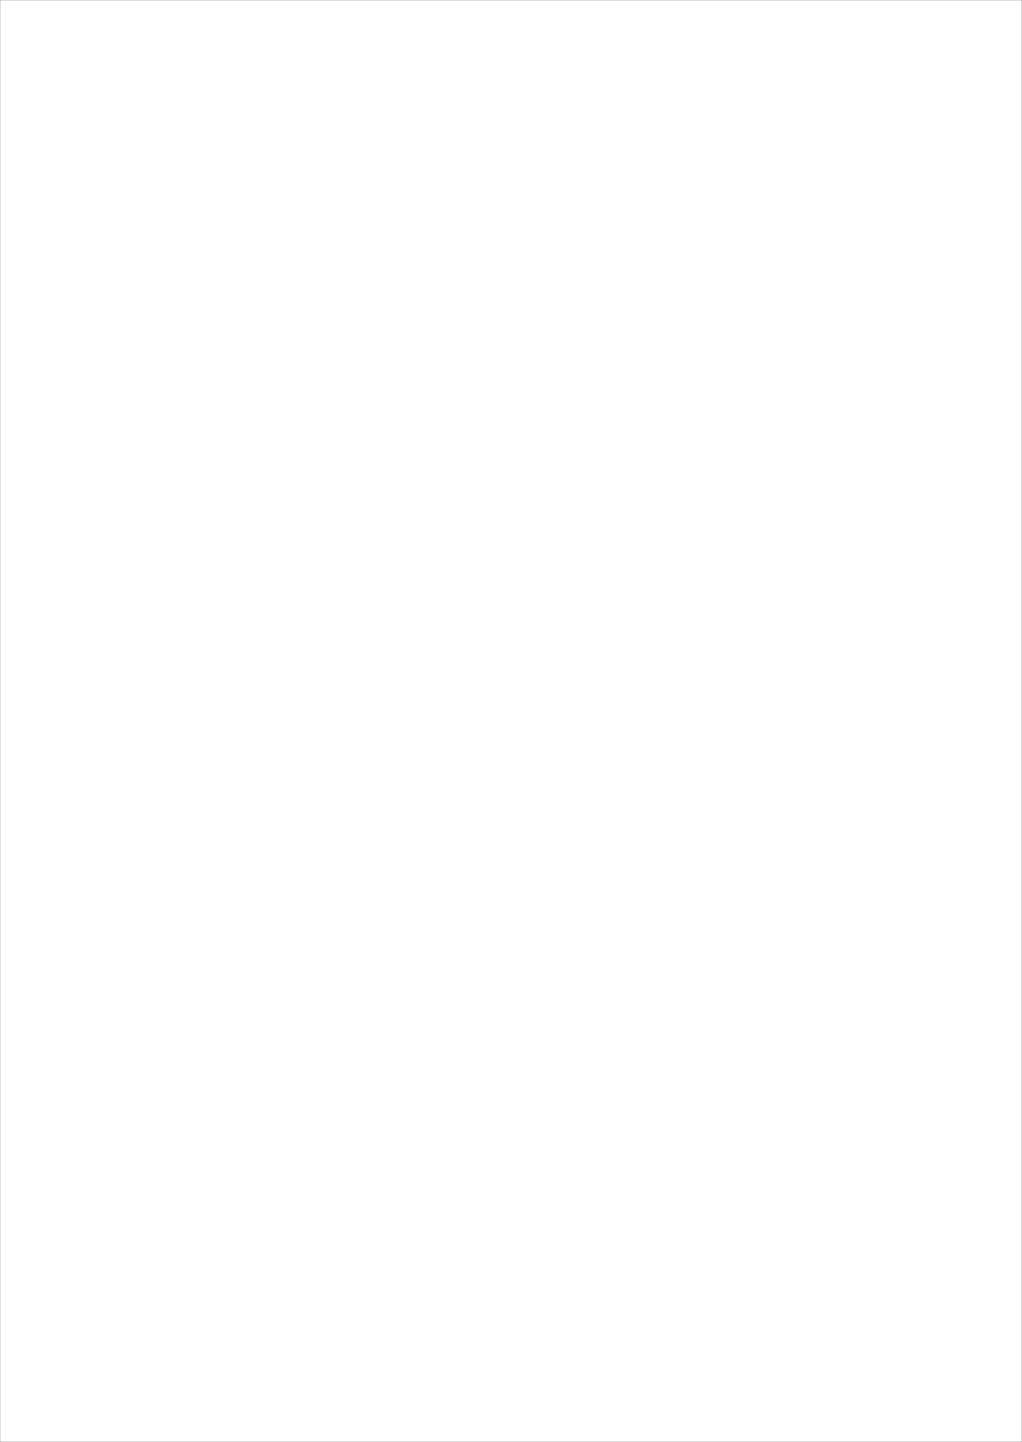 Kiyohime Lovers Vol. 01 - Kiyohime to Hajimete 3